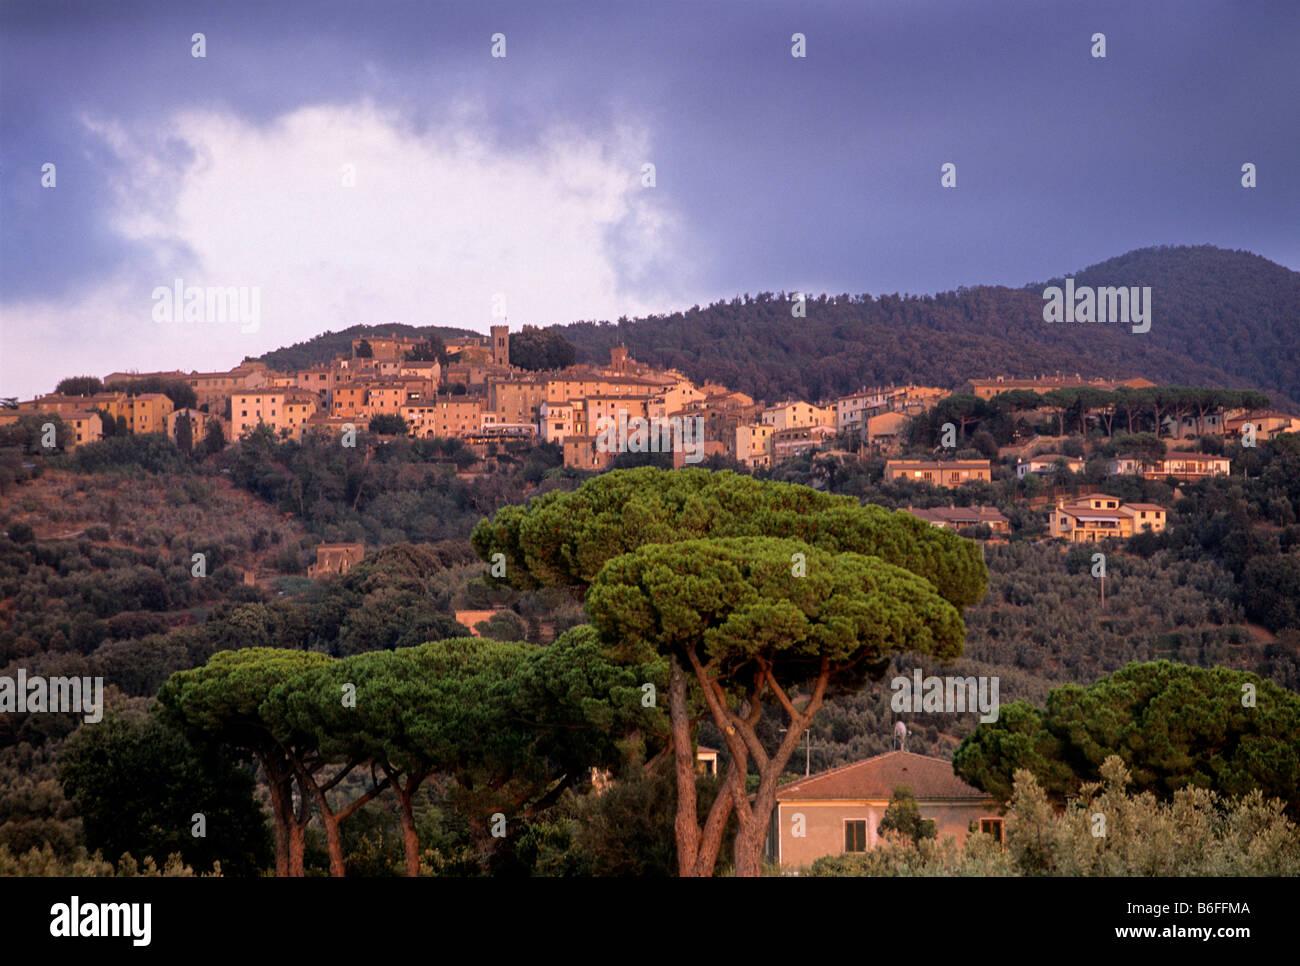 Castagneto Carducci, Livorno Provinz, Toskana, Italien, Europa Stockbild